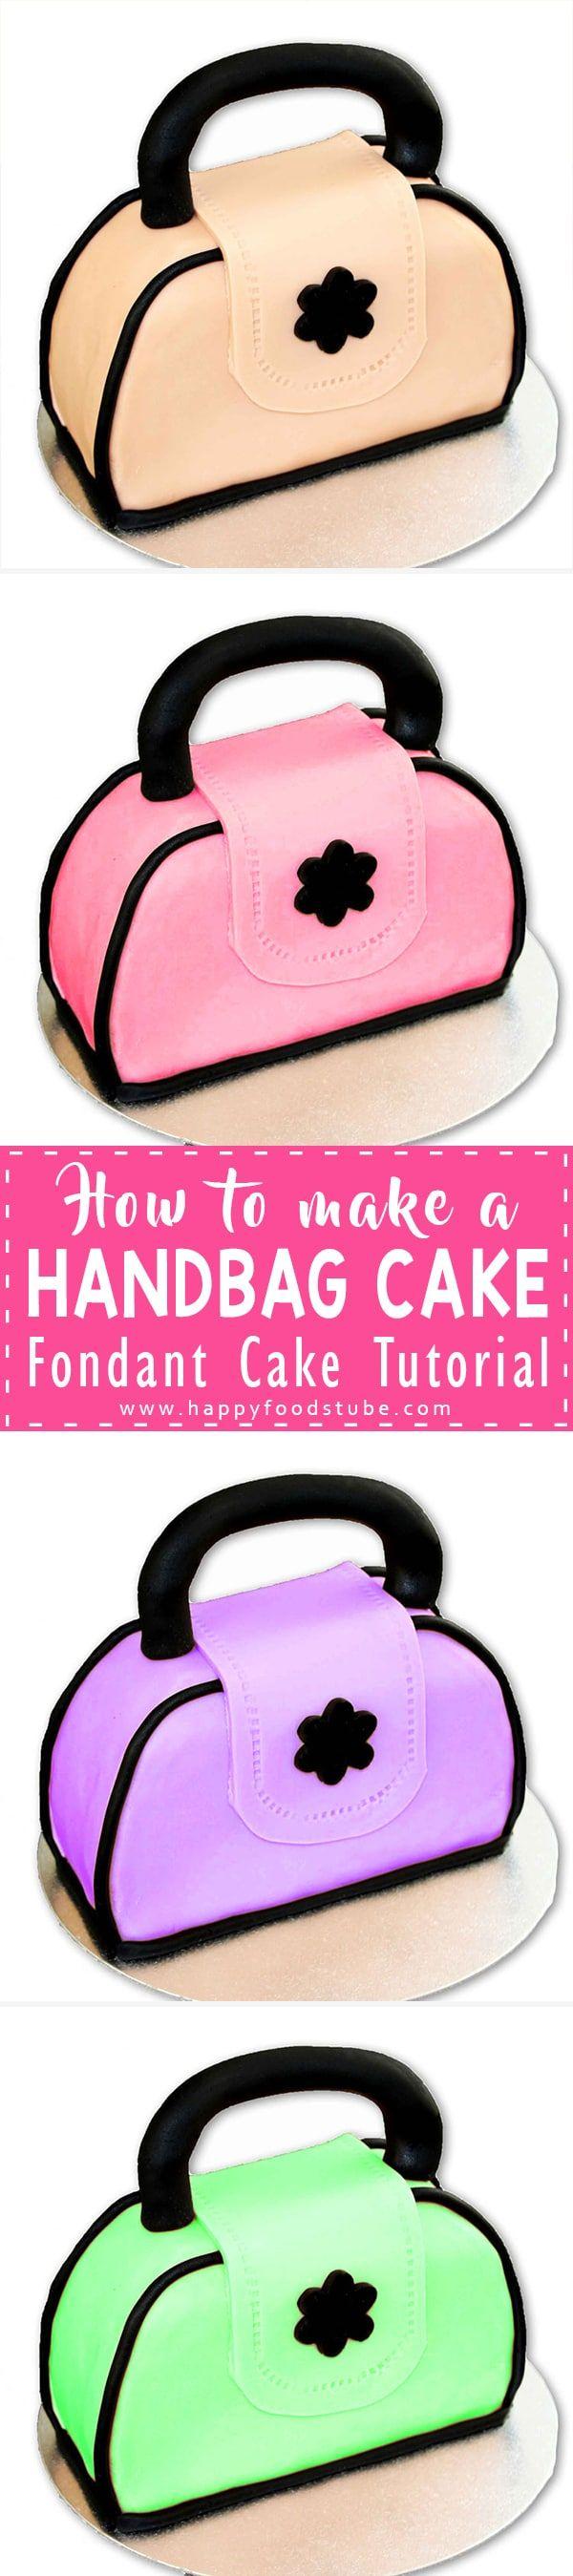 Learn how to make this fondant Handbag Cake. It's simple & easy to make. Great birthday cake idea for all ladies who love handbags. Fondant cake tutorial via @happyfoodstube